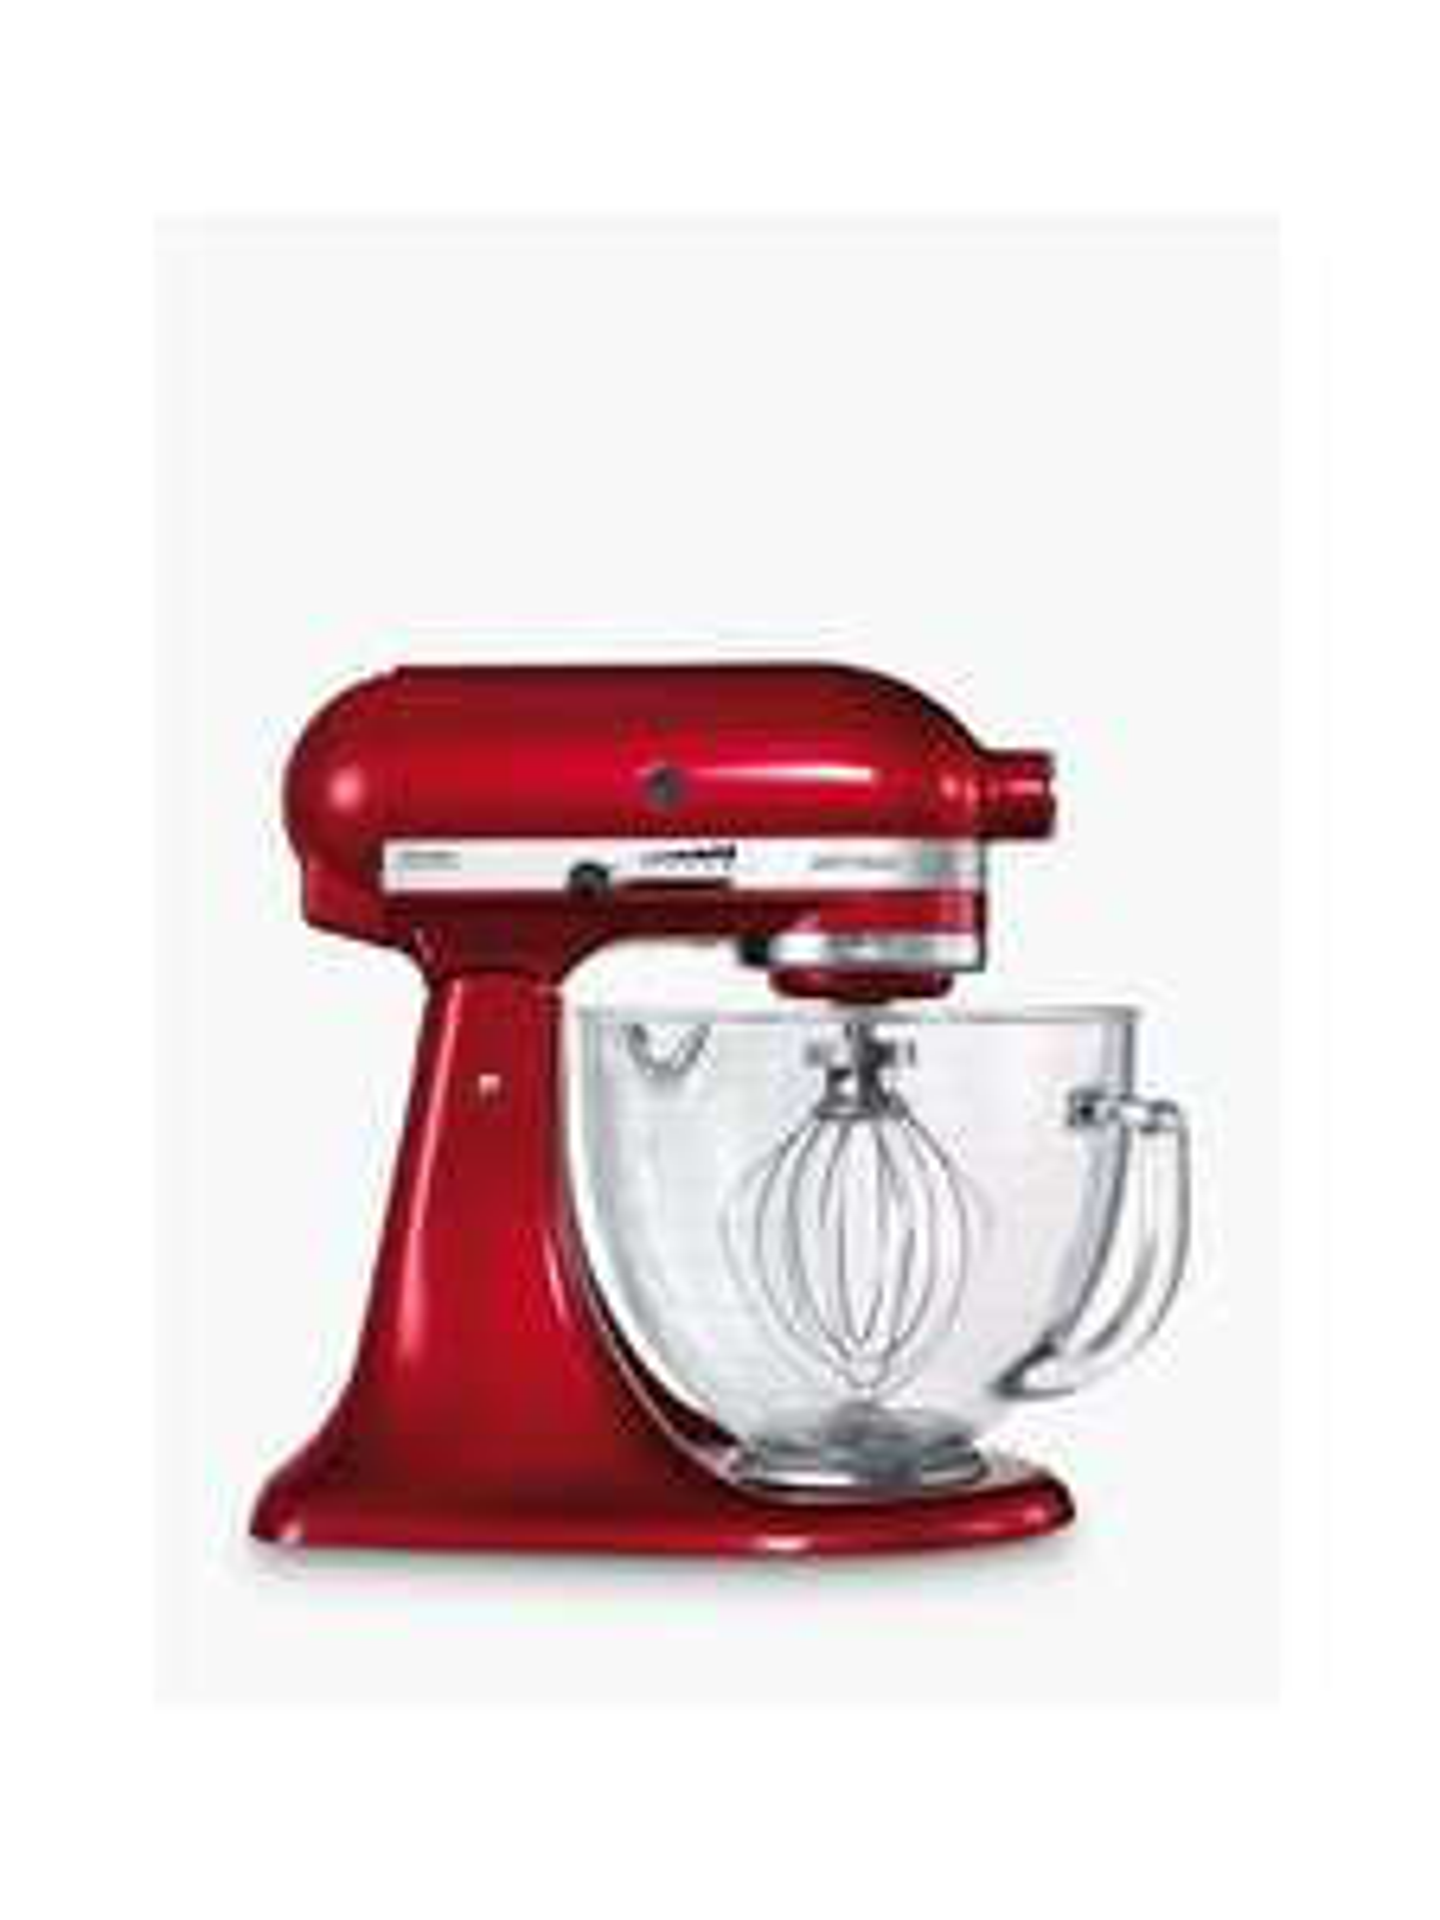 KitchenAid Artisan 4.8L Stand Mixer, Candy Apple Red £329 @ John Lewis & Partners